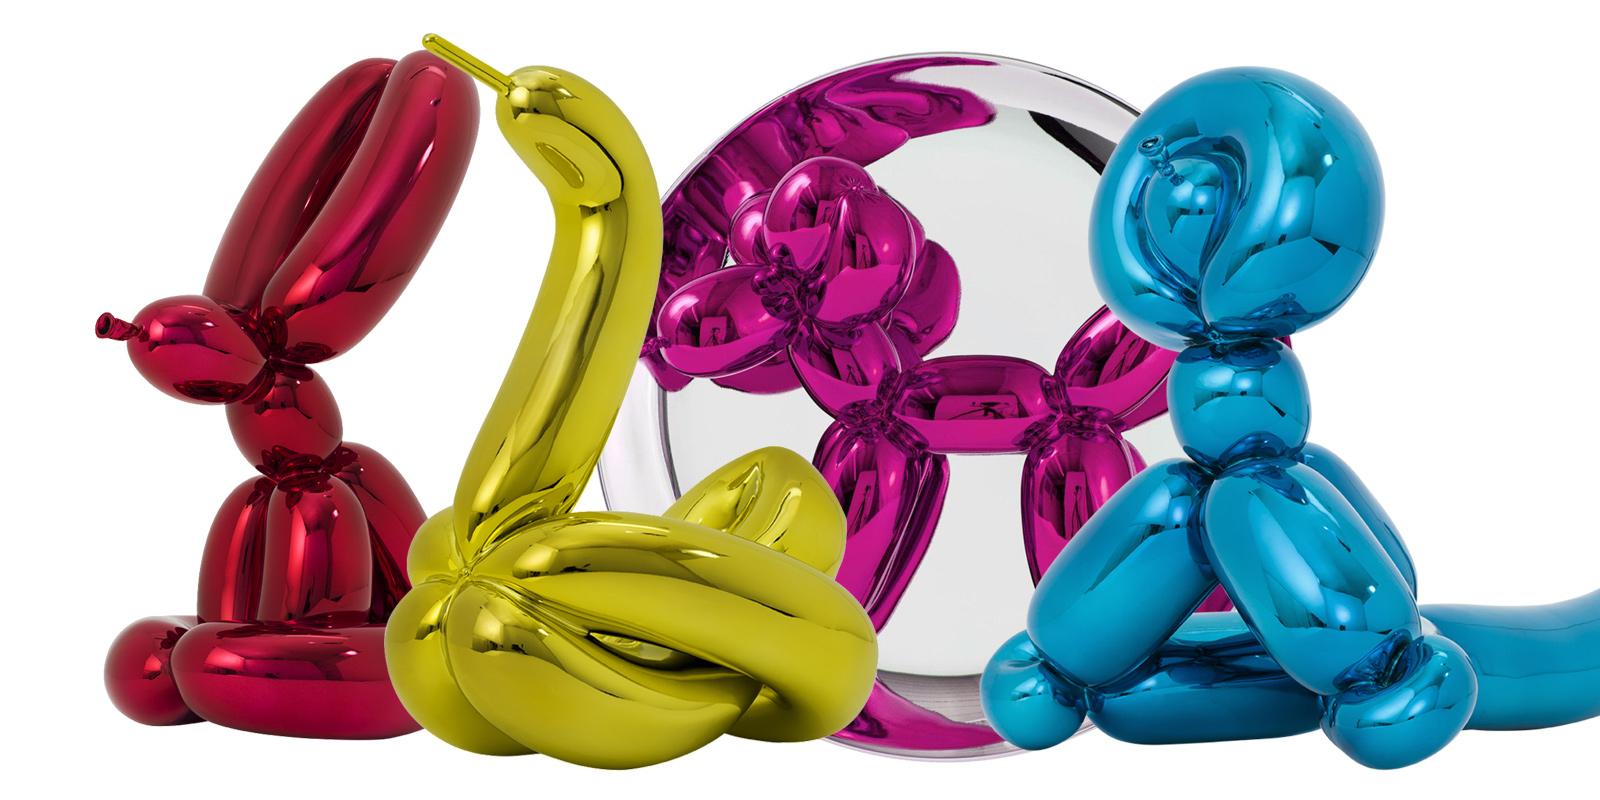 balloons by jeff koons - artist presented by premium modern art